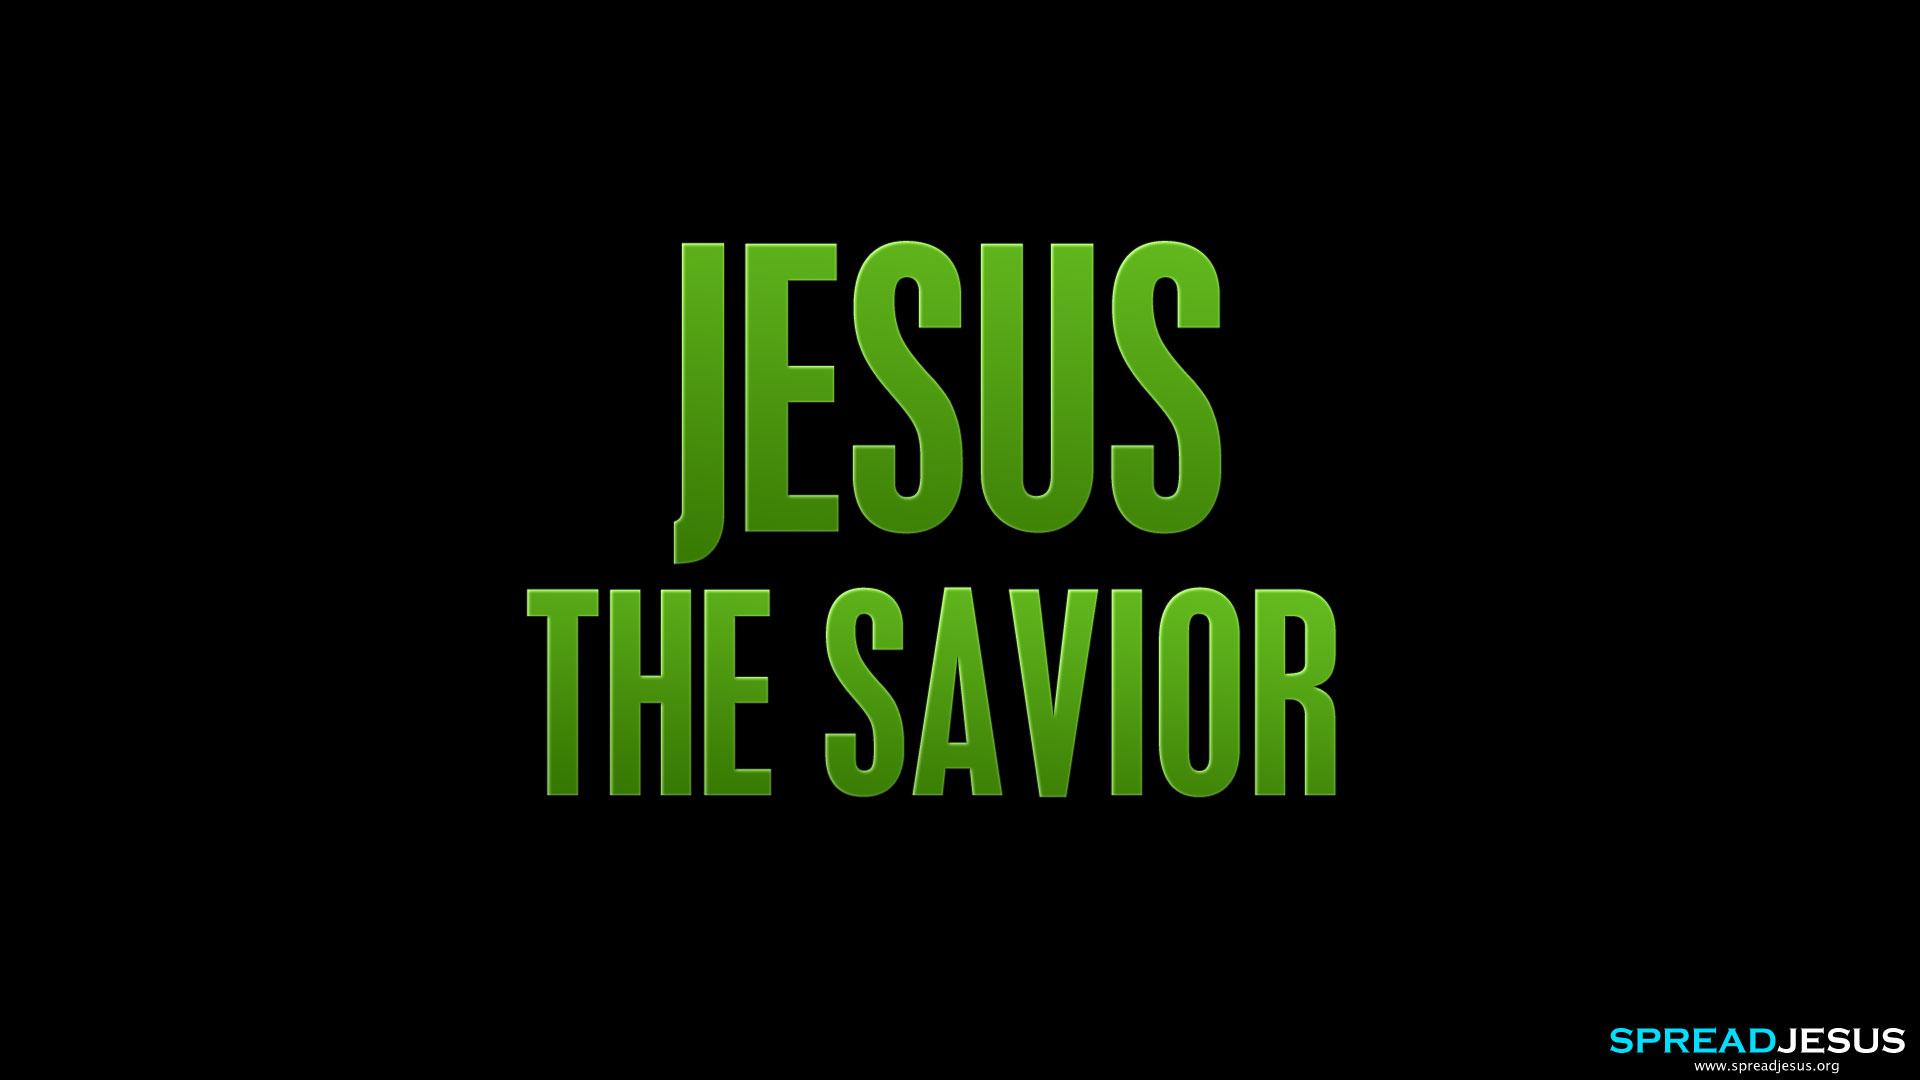 jesus wallpapers jesus the savior wallpaper Hd jesus wallpapers 3jpg 1920x1080